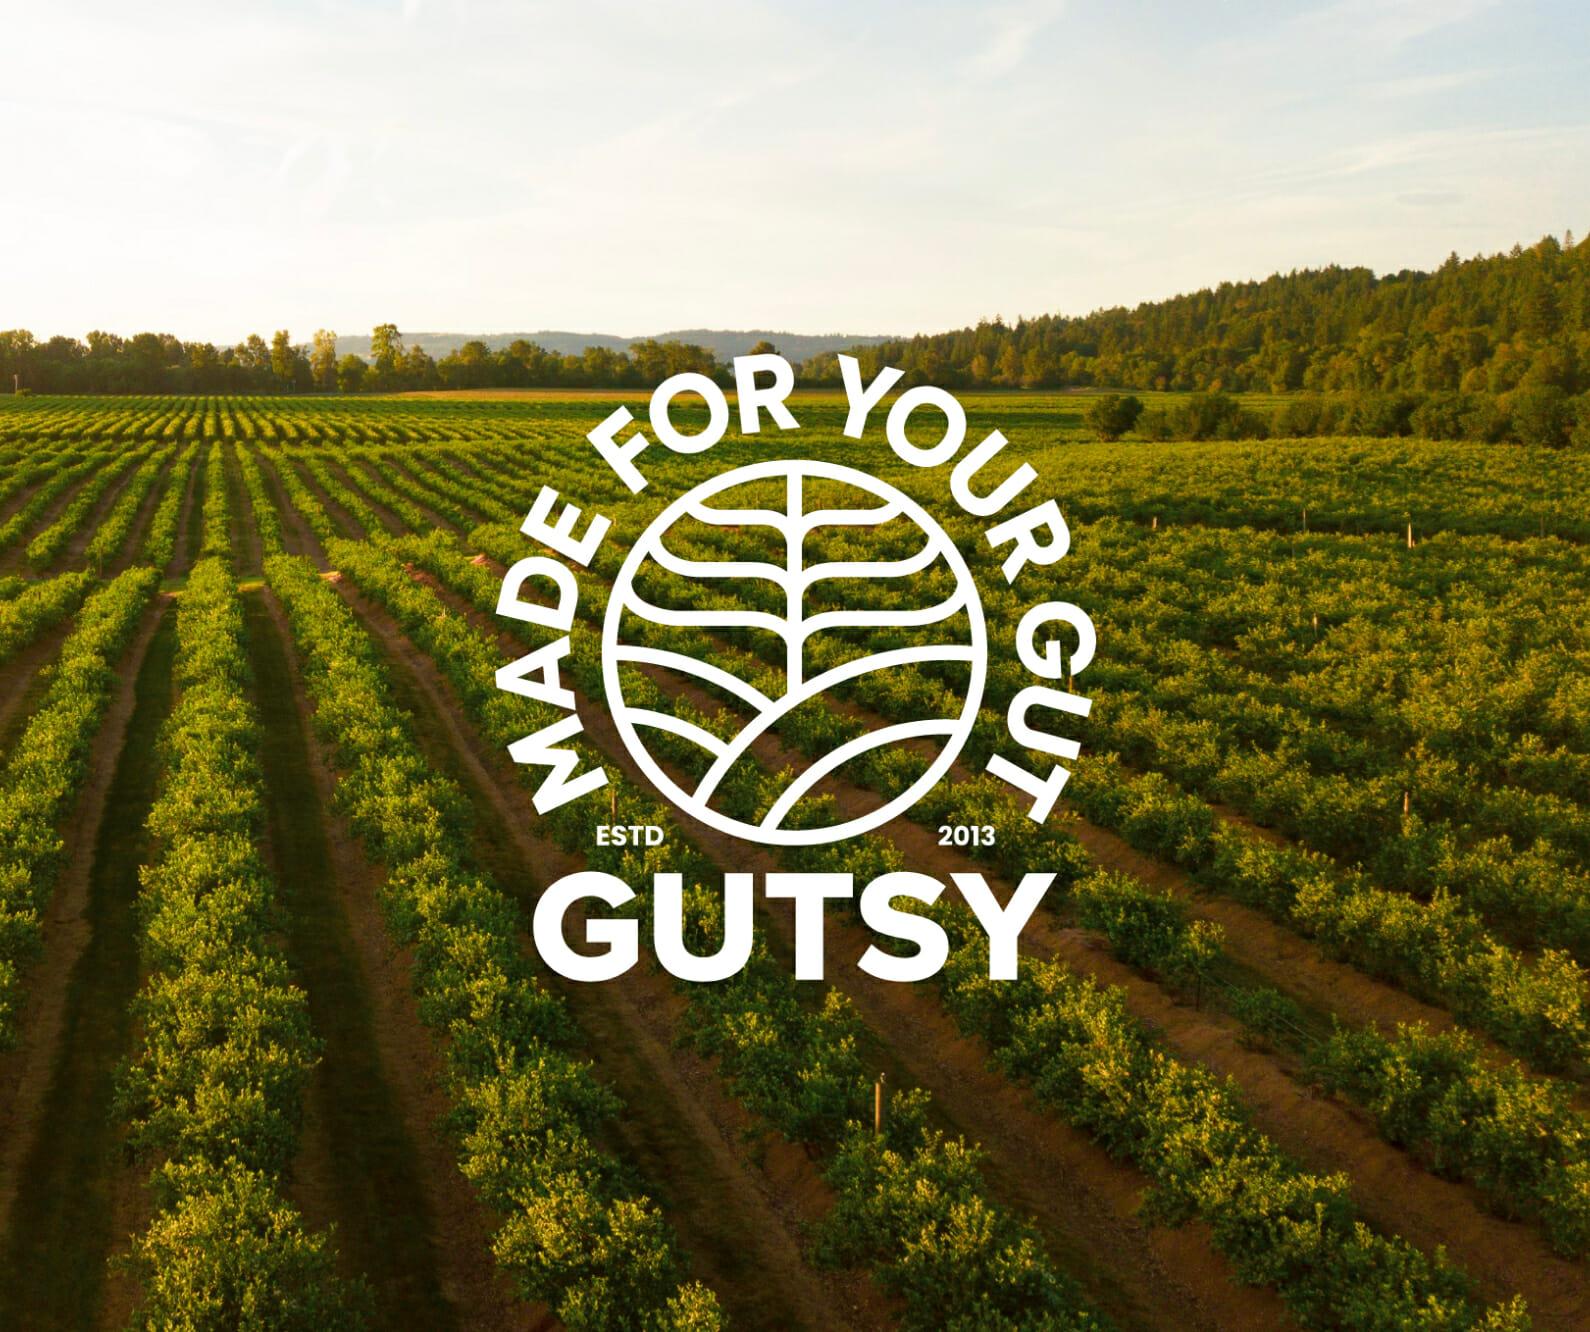 A tasty brand remake for Gutsy